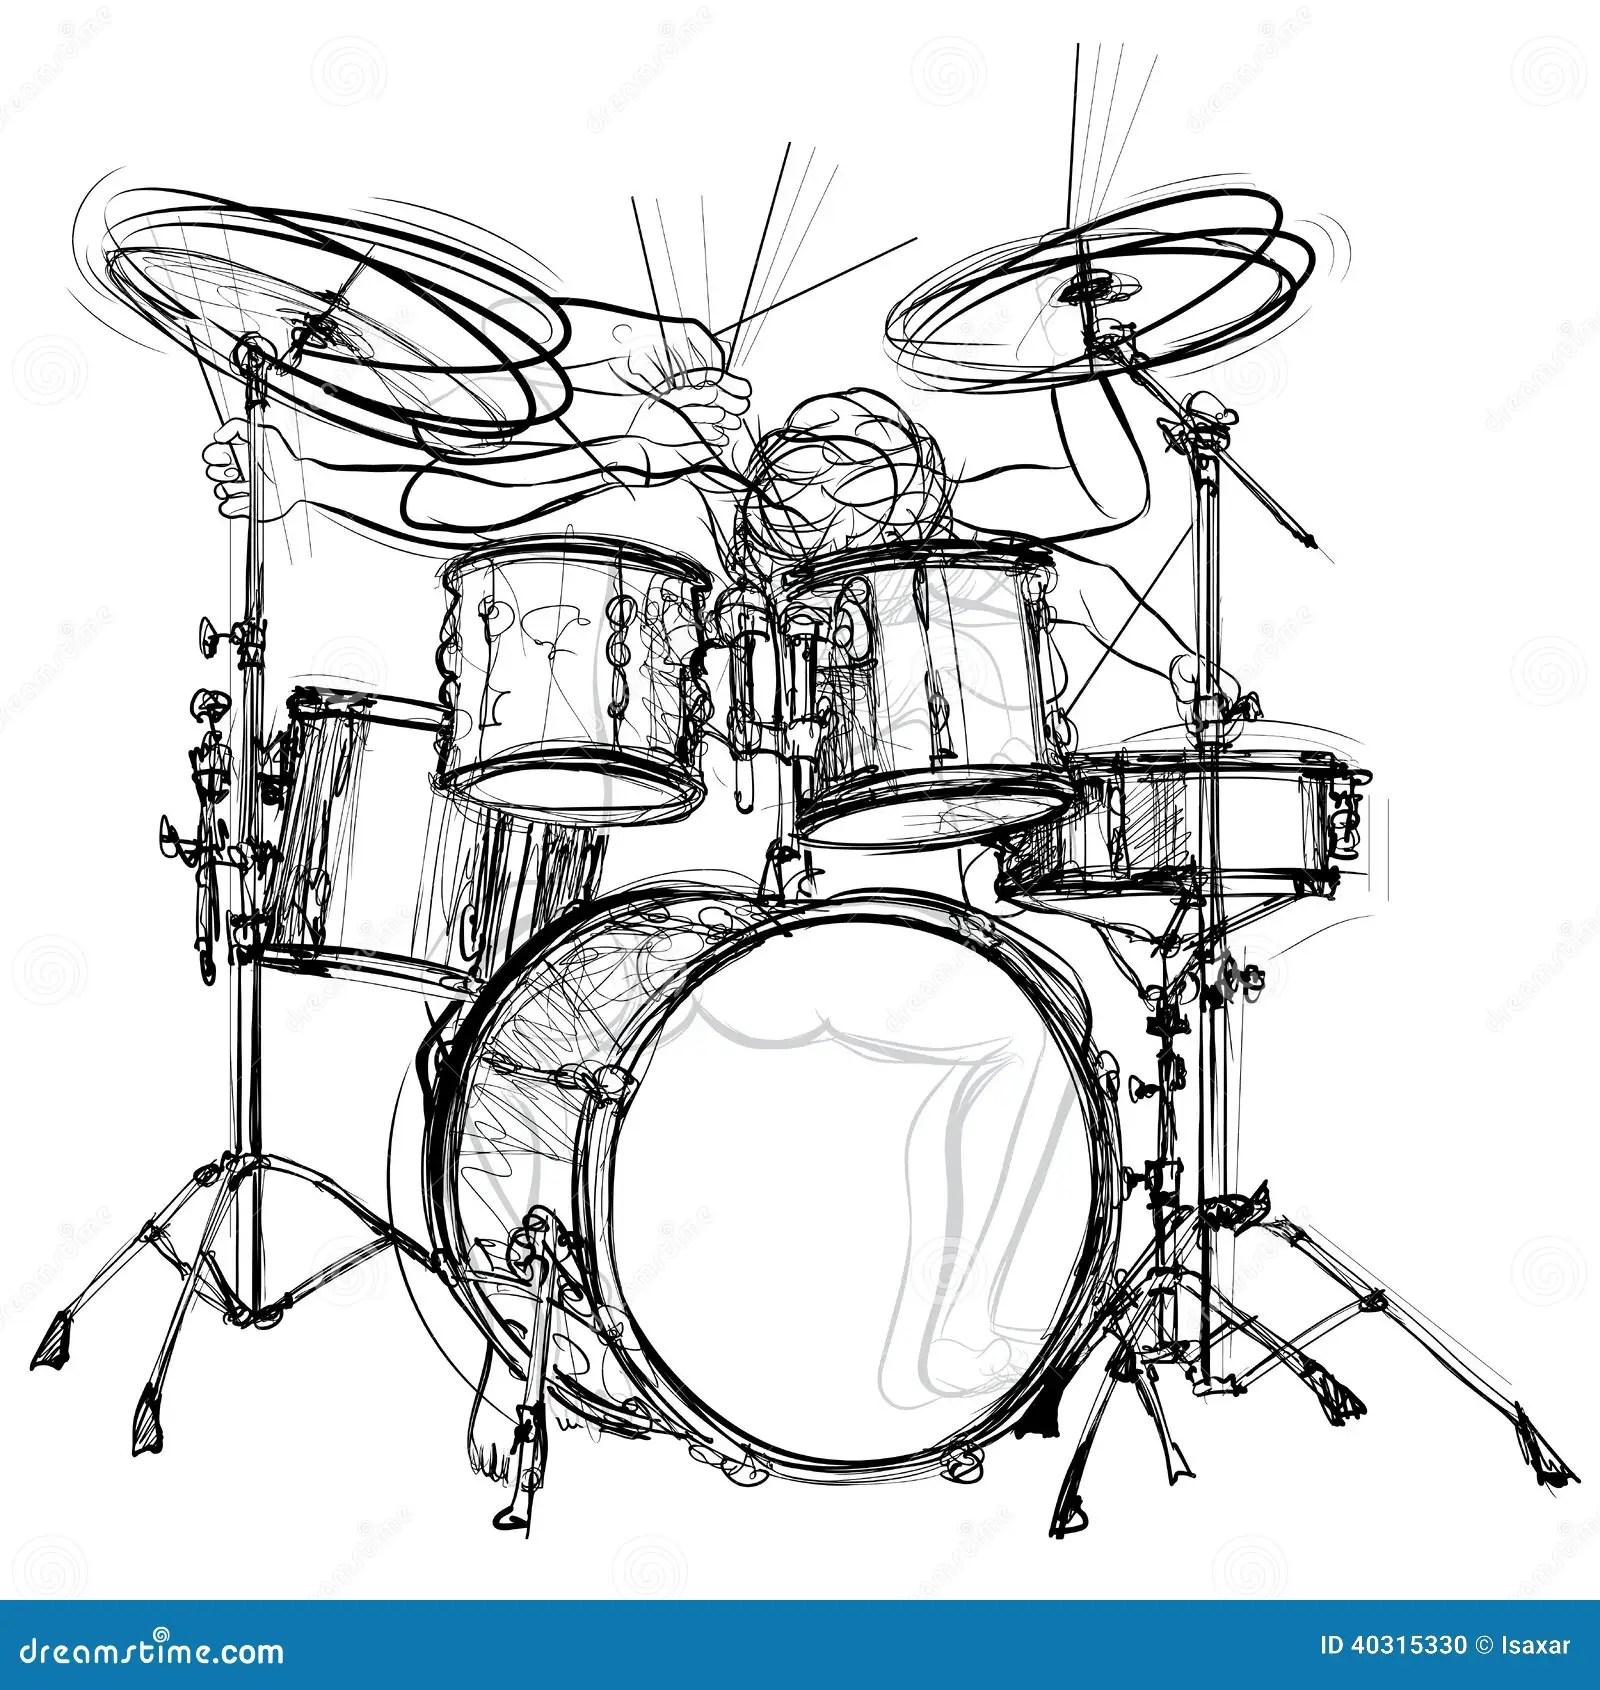 Drummer stock vector. Illustration of concert, drummer